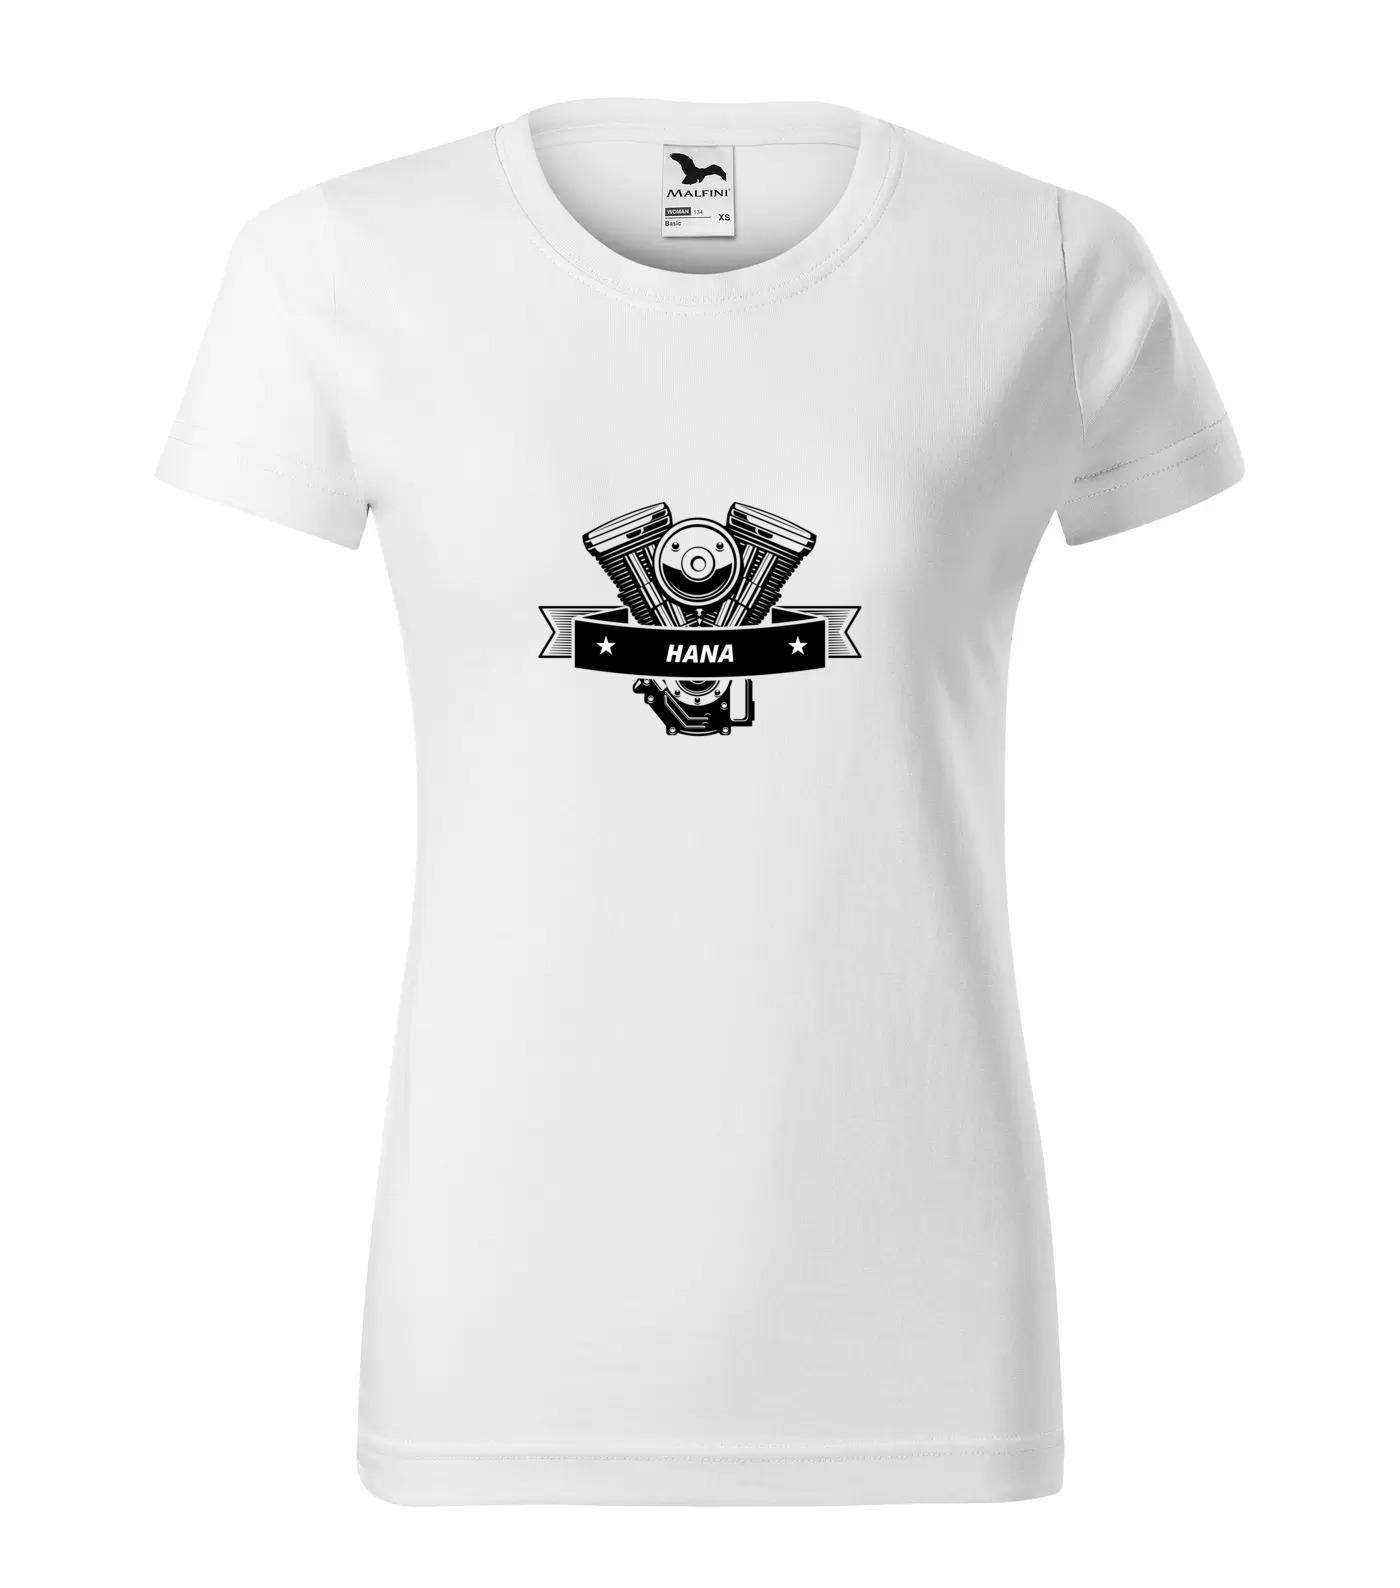 Tričko Motorkářka Hana